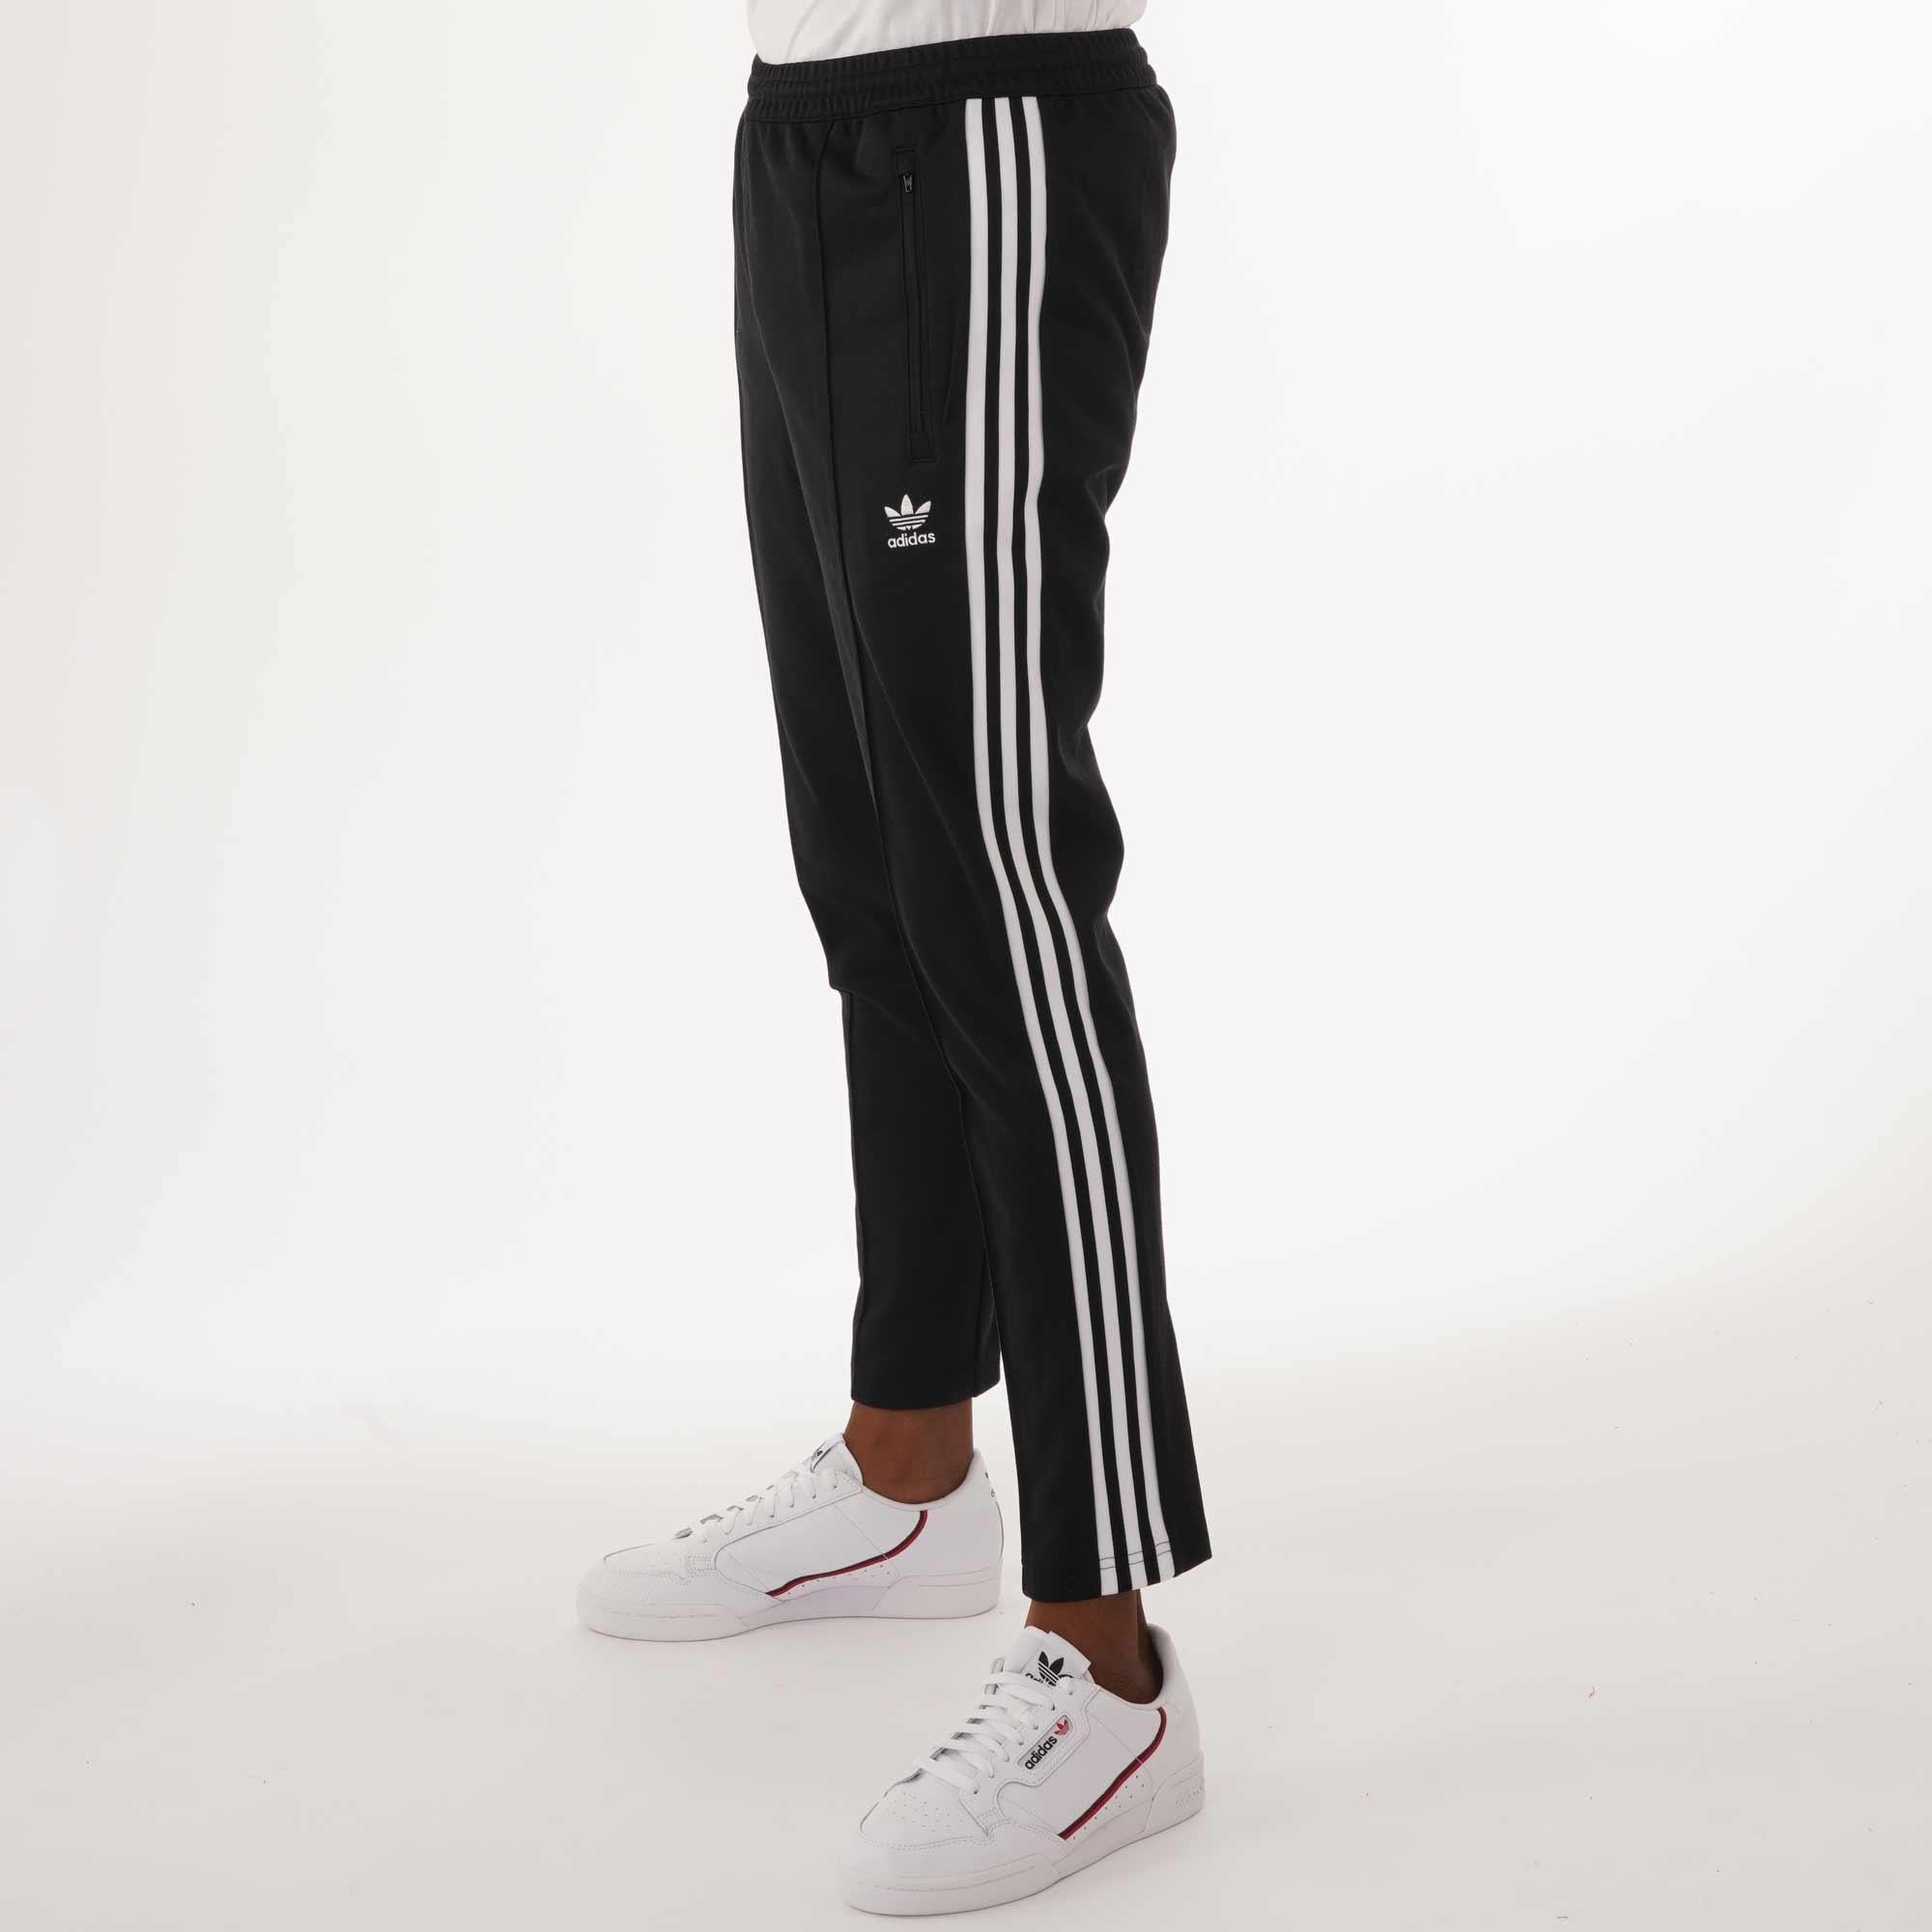 new specials various design release date: adidas Originals Beckenbauer Track Pant